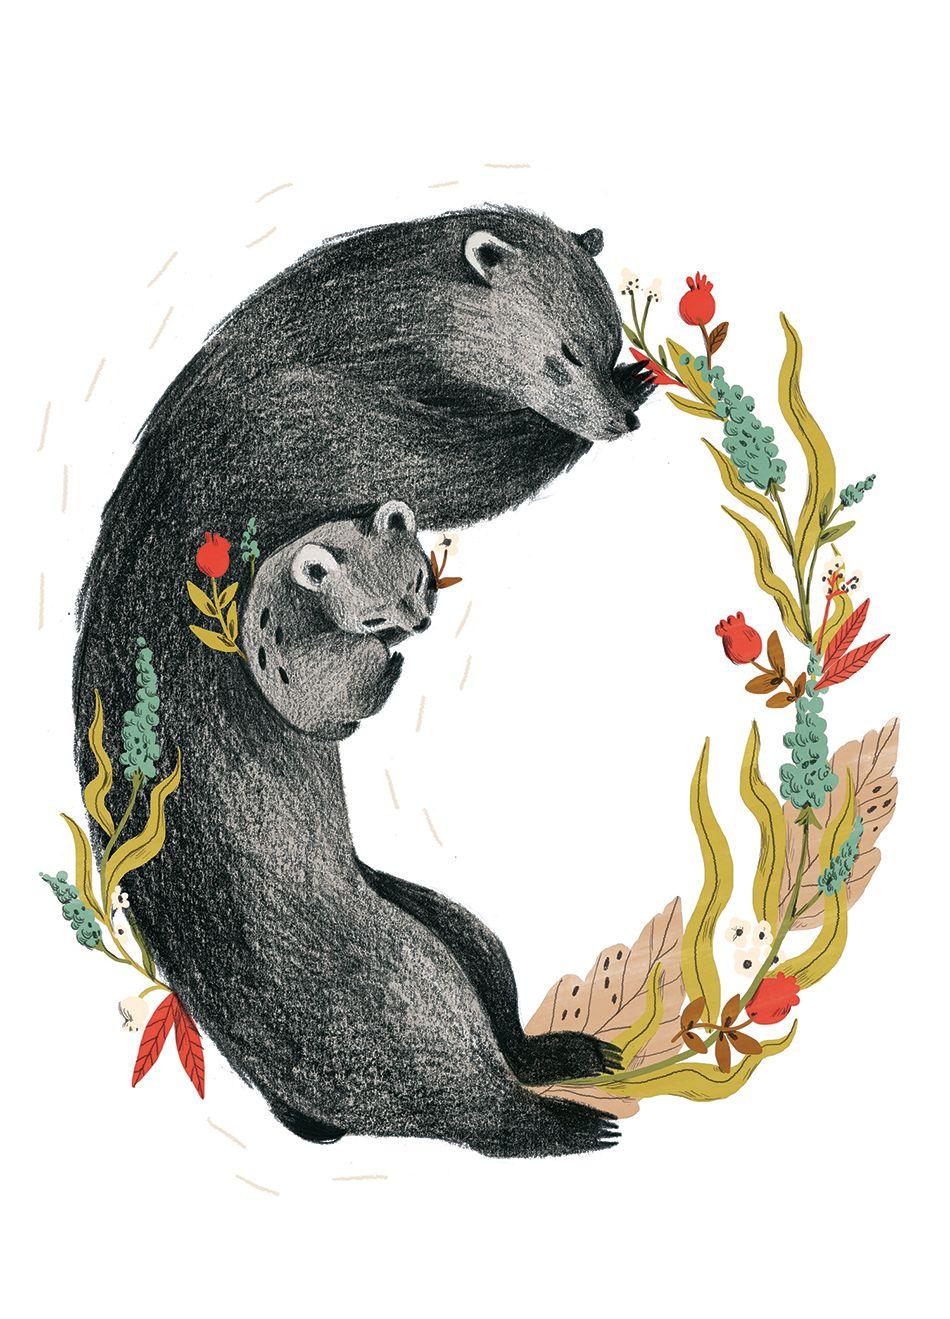 Lucille Michieli For Anthropologie Illustrations Animalieres Art Animalier Art Et Illustration